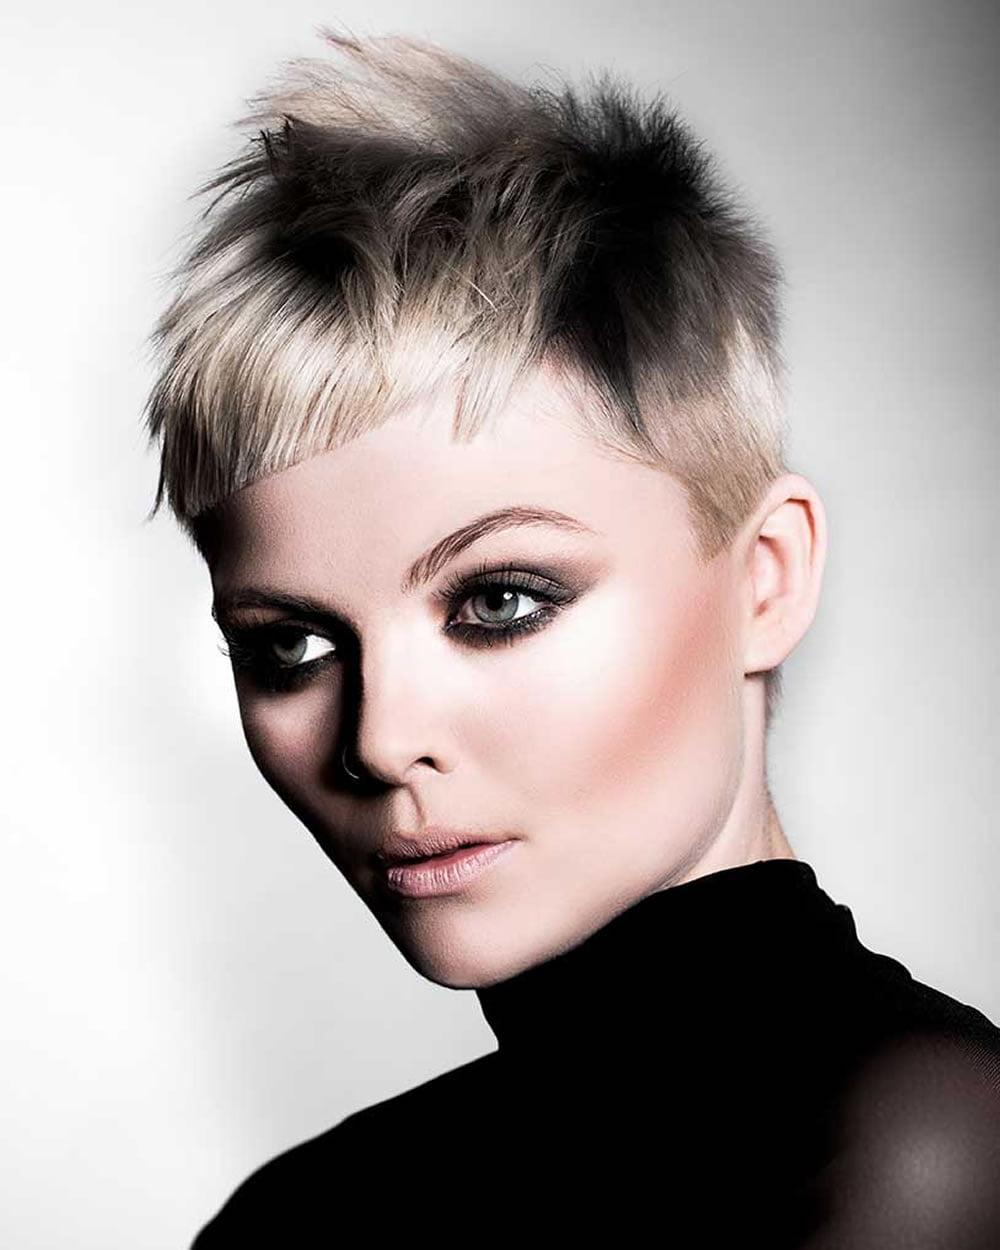 11 More Hot Easy Short Haircuts